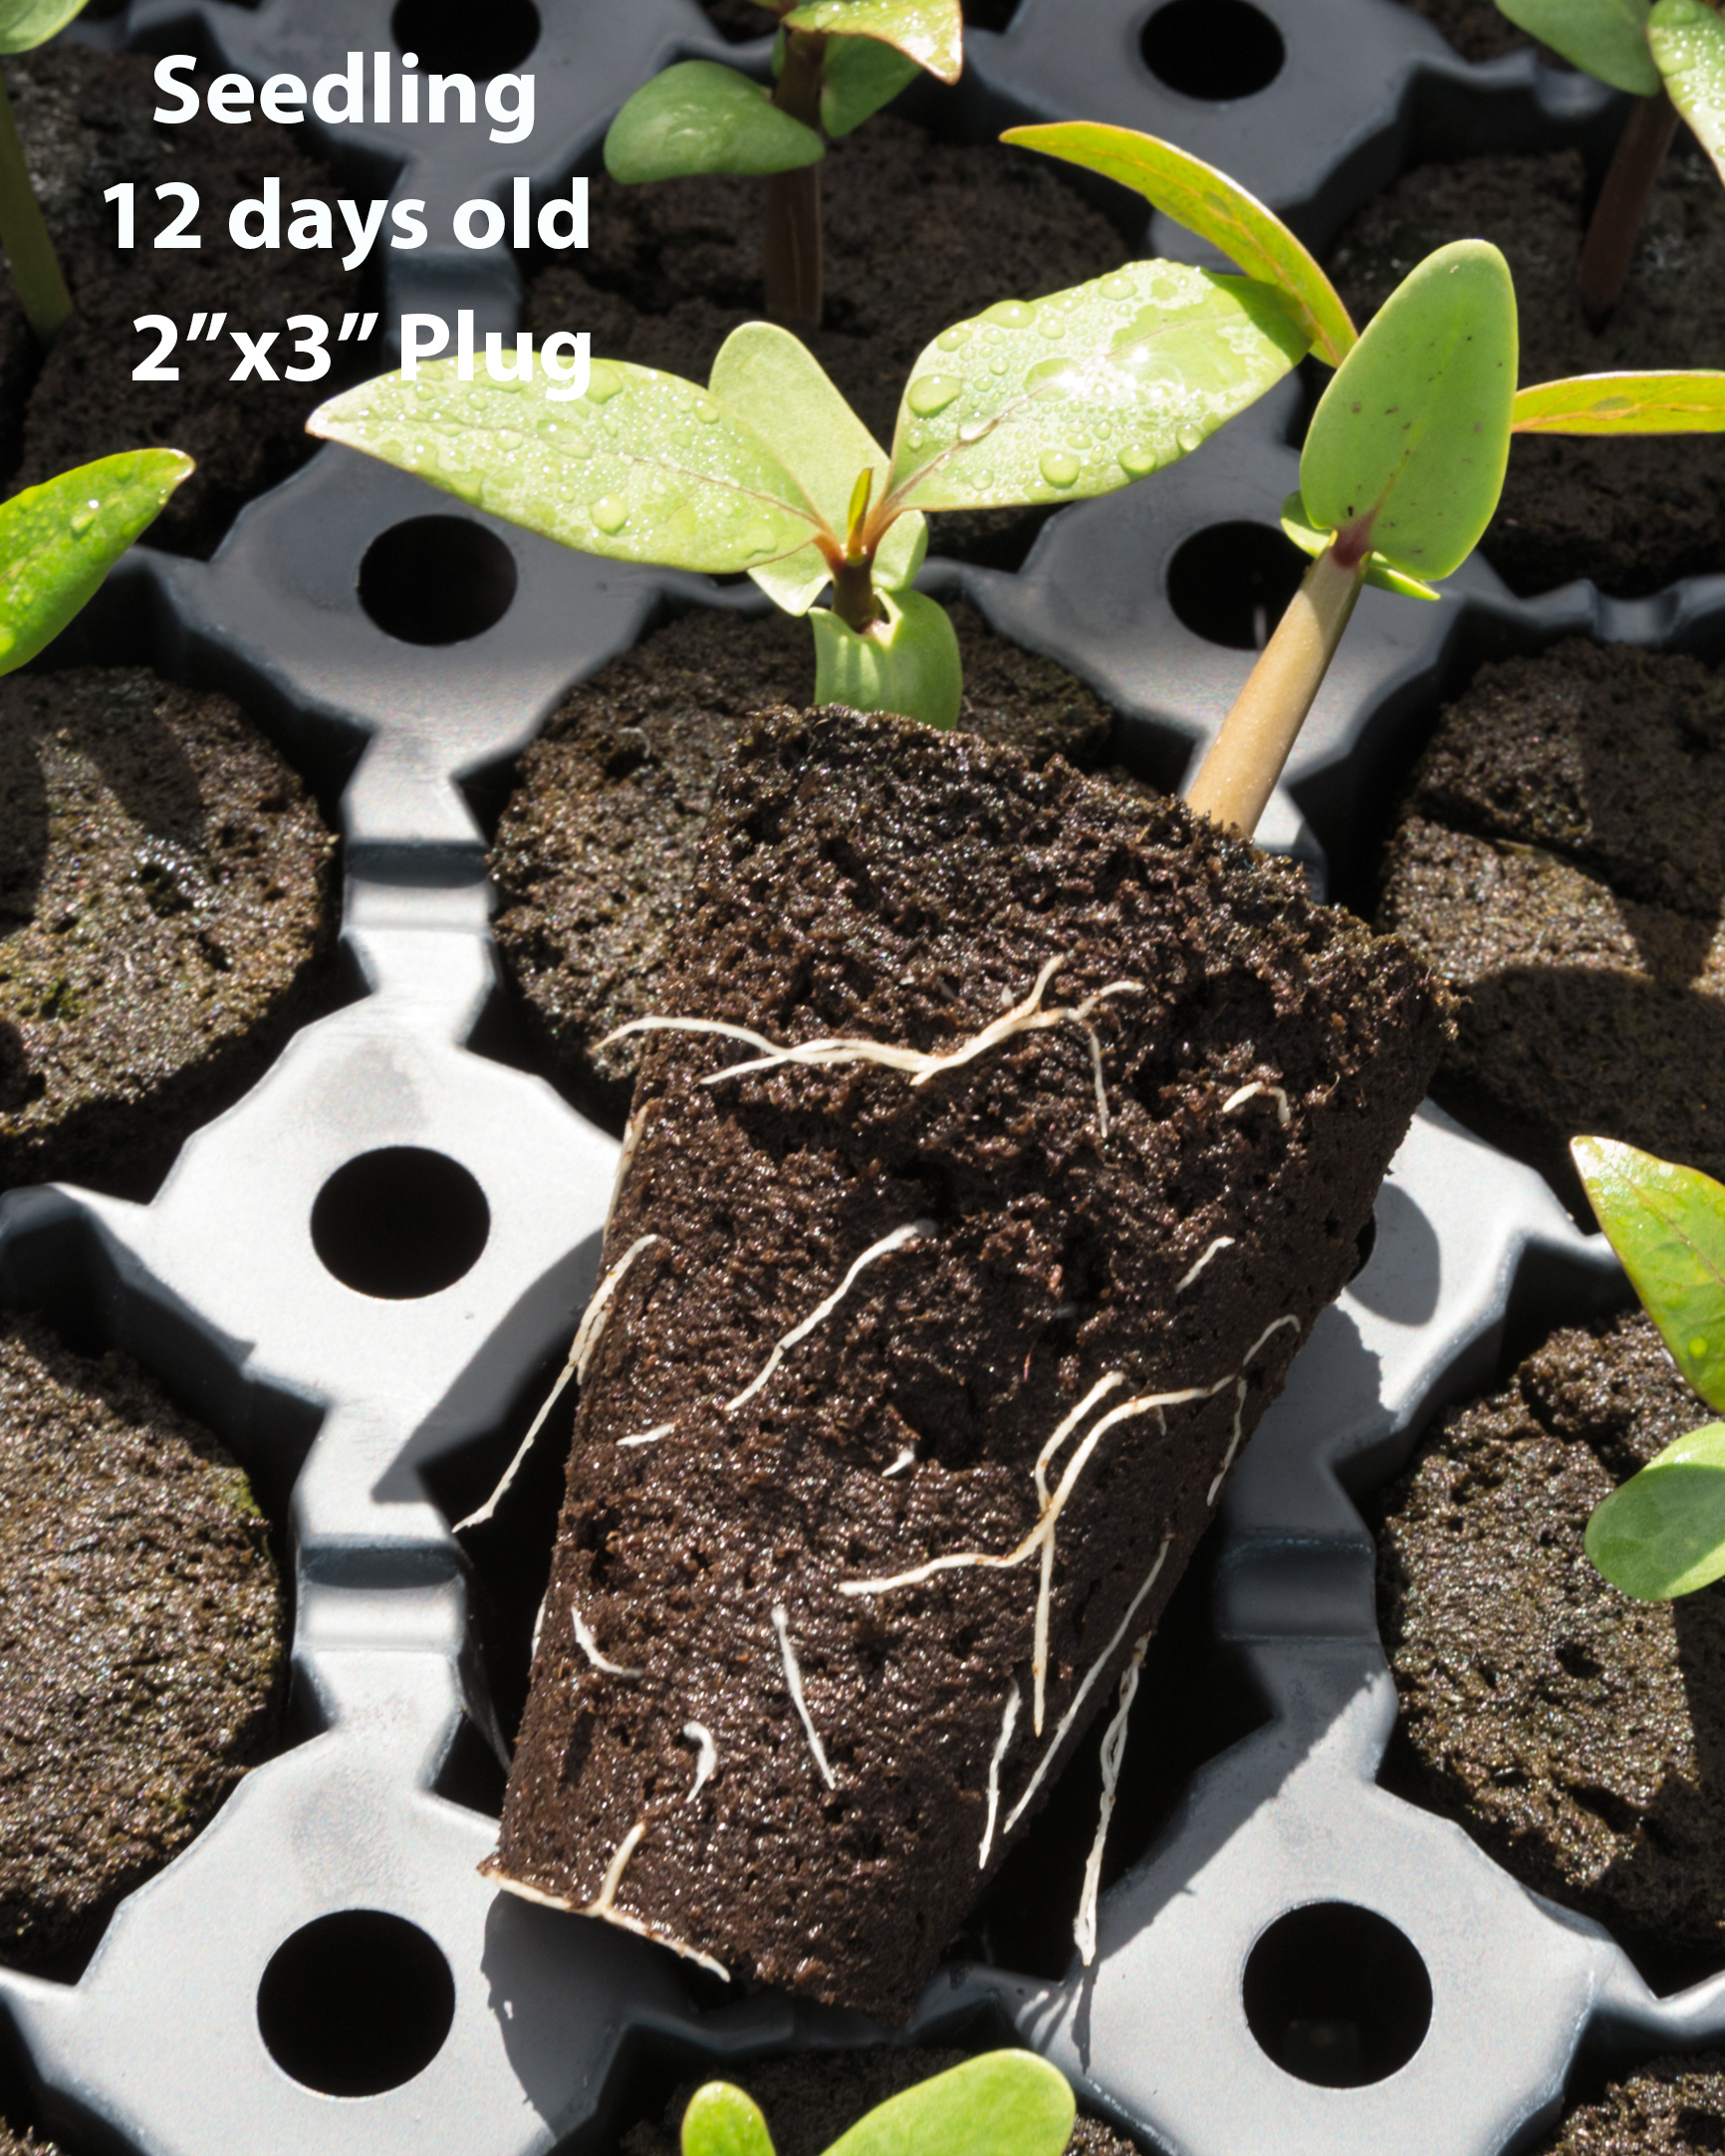 large-plug-seedling-12-days-8348.jpg